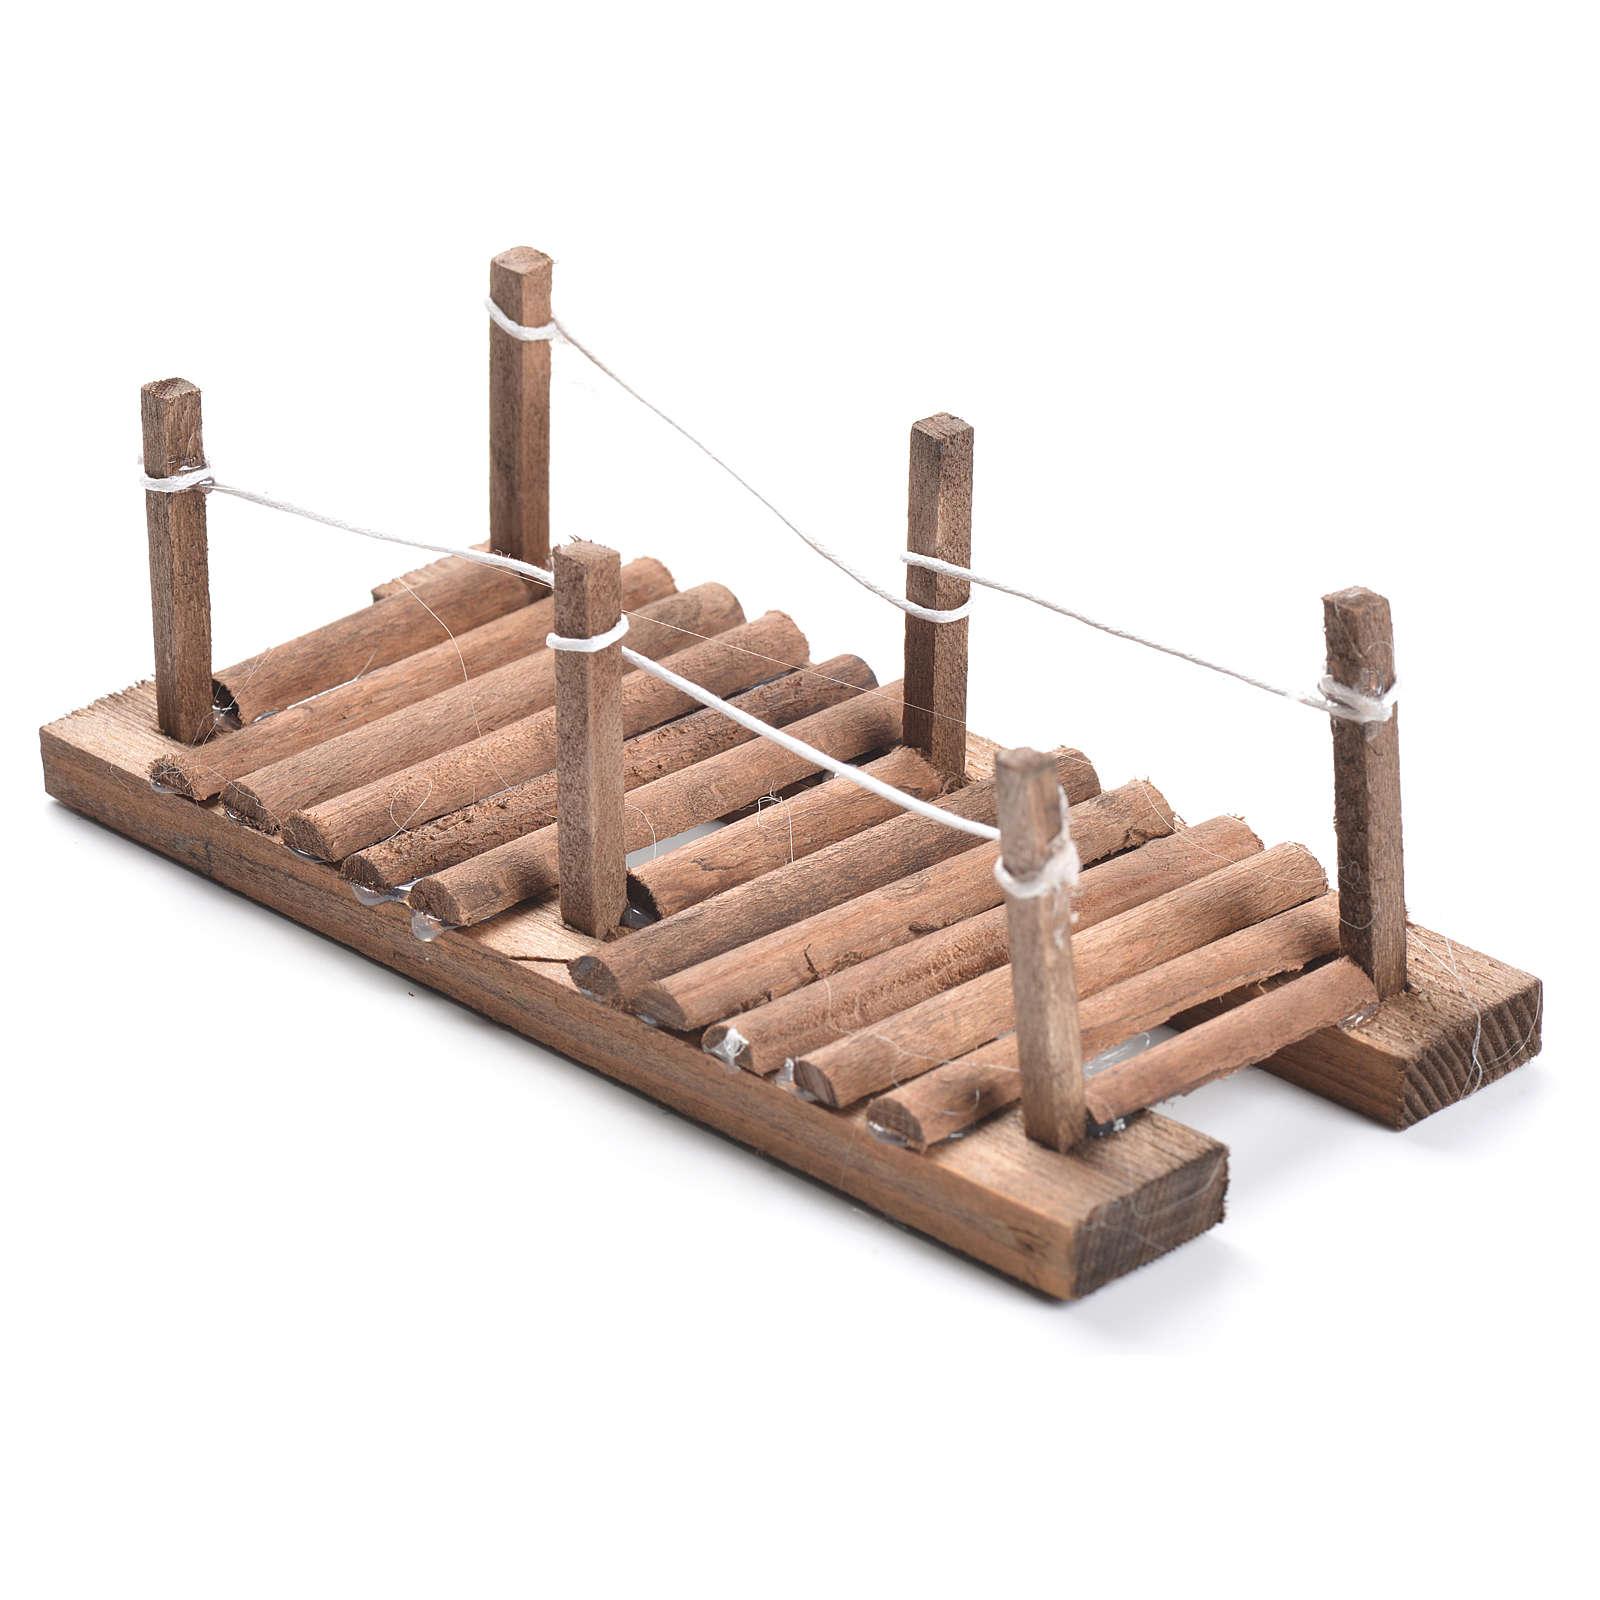 Nativity setting, footbridge in wood measuring 5x15x7cm 4